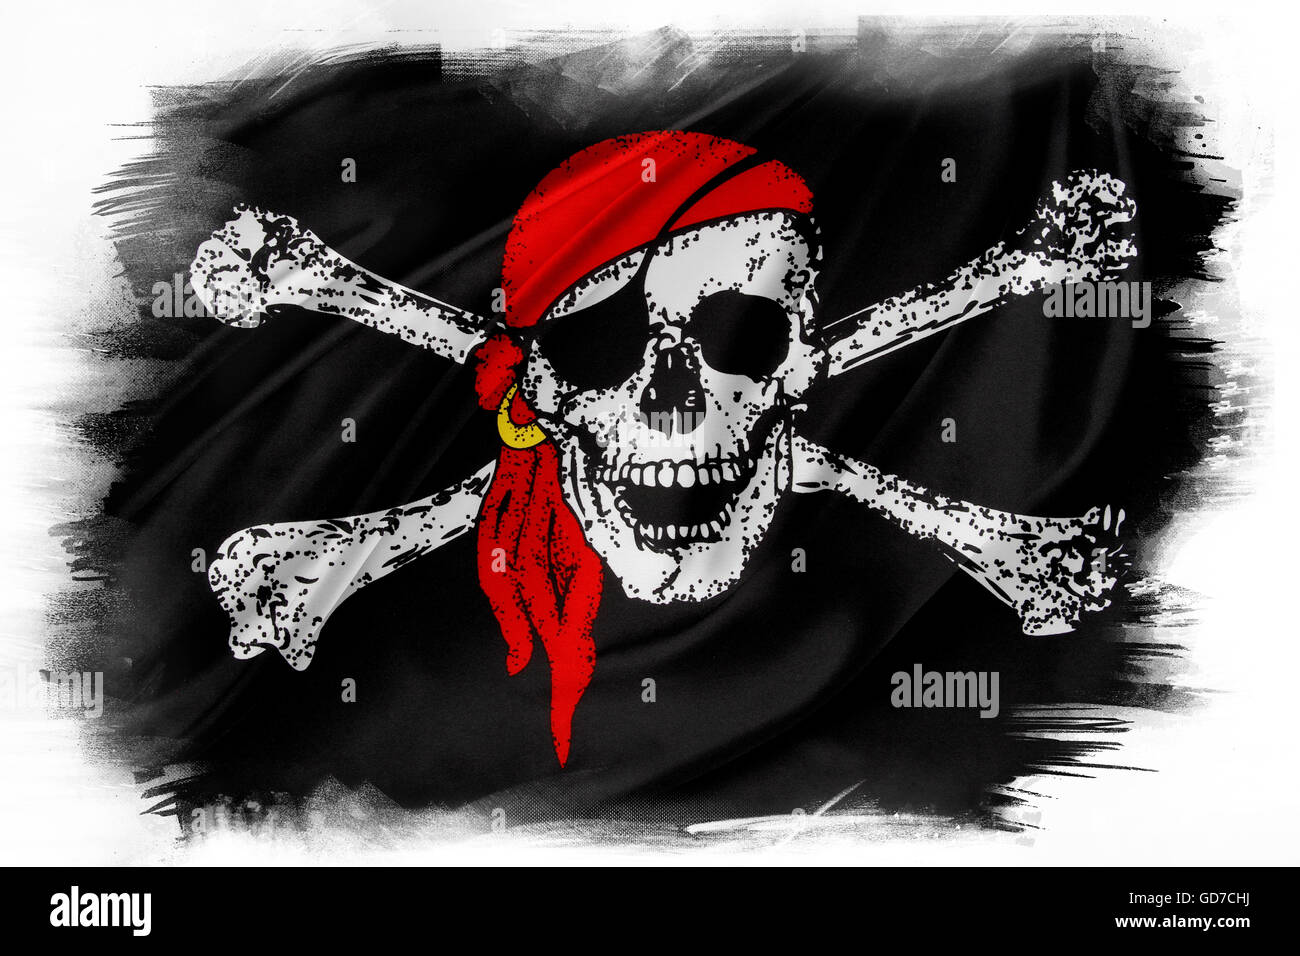 Pirate flag on plain background - Stock Image